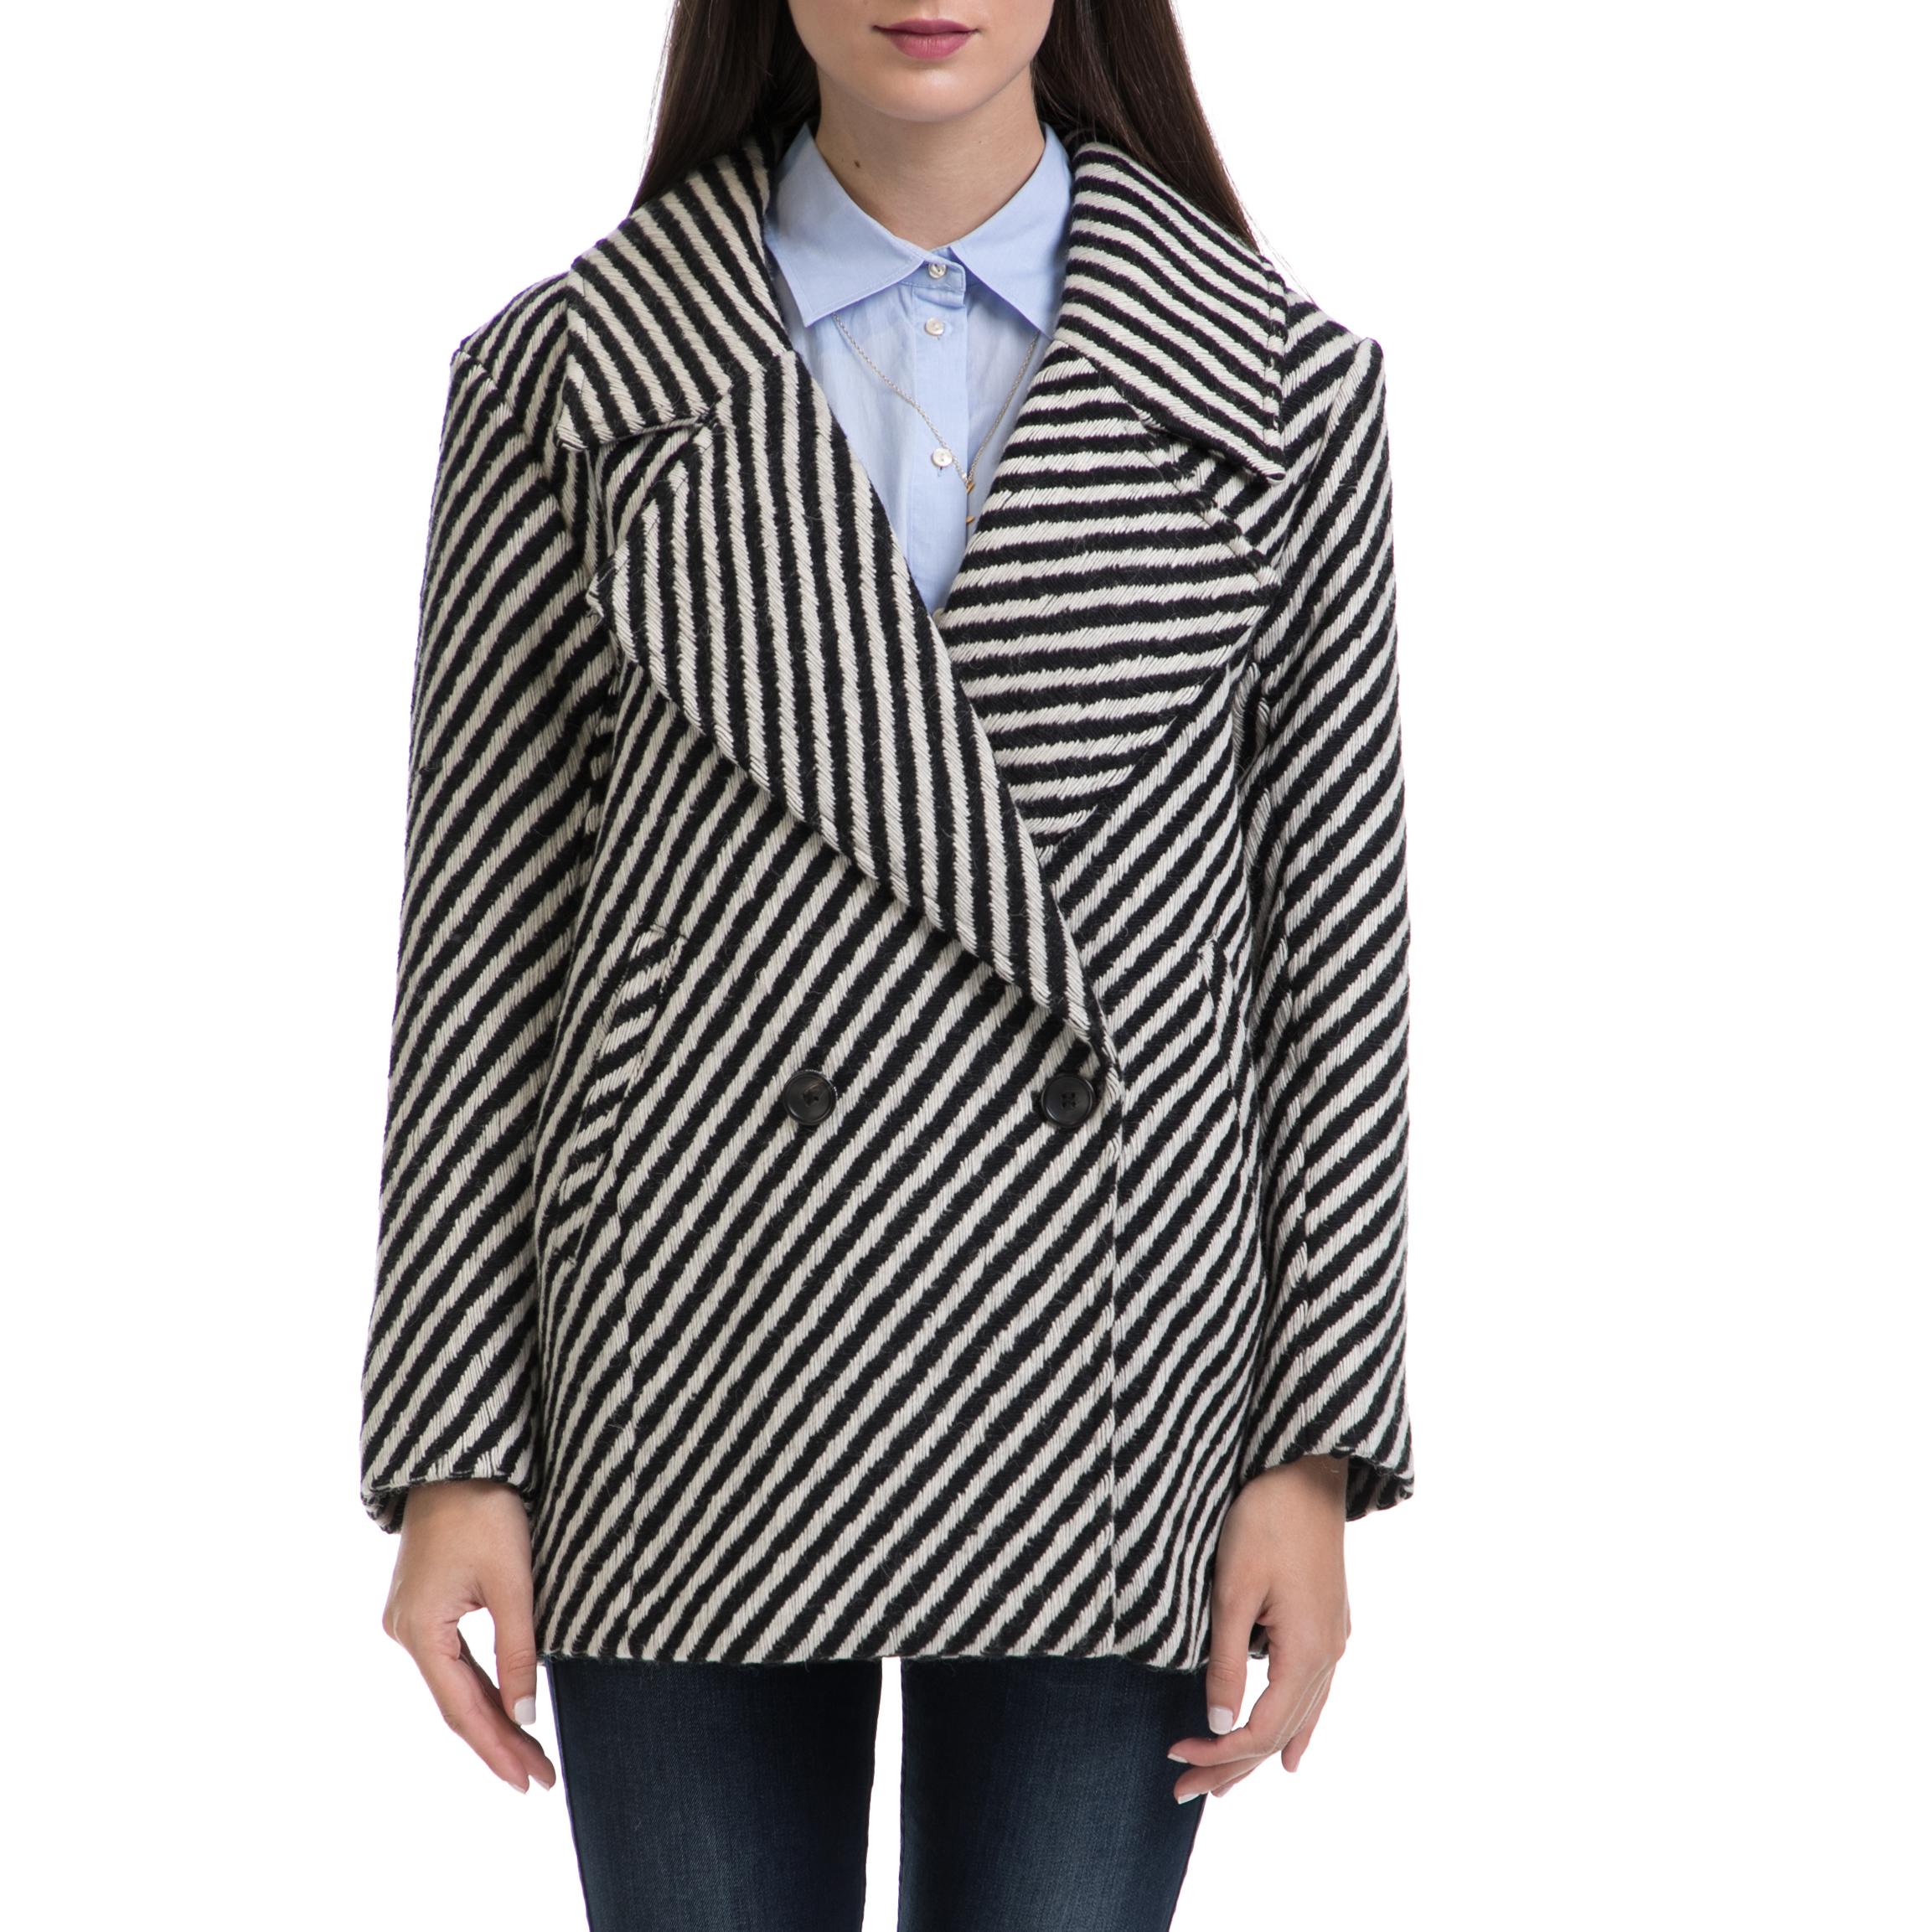 SCOTCH & SODA - Γυναικείο παλτό MAISON SCOTCH άσπρο-μαύρο γυναικεία ρούχα πανωφόρια παλτό